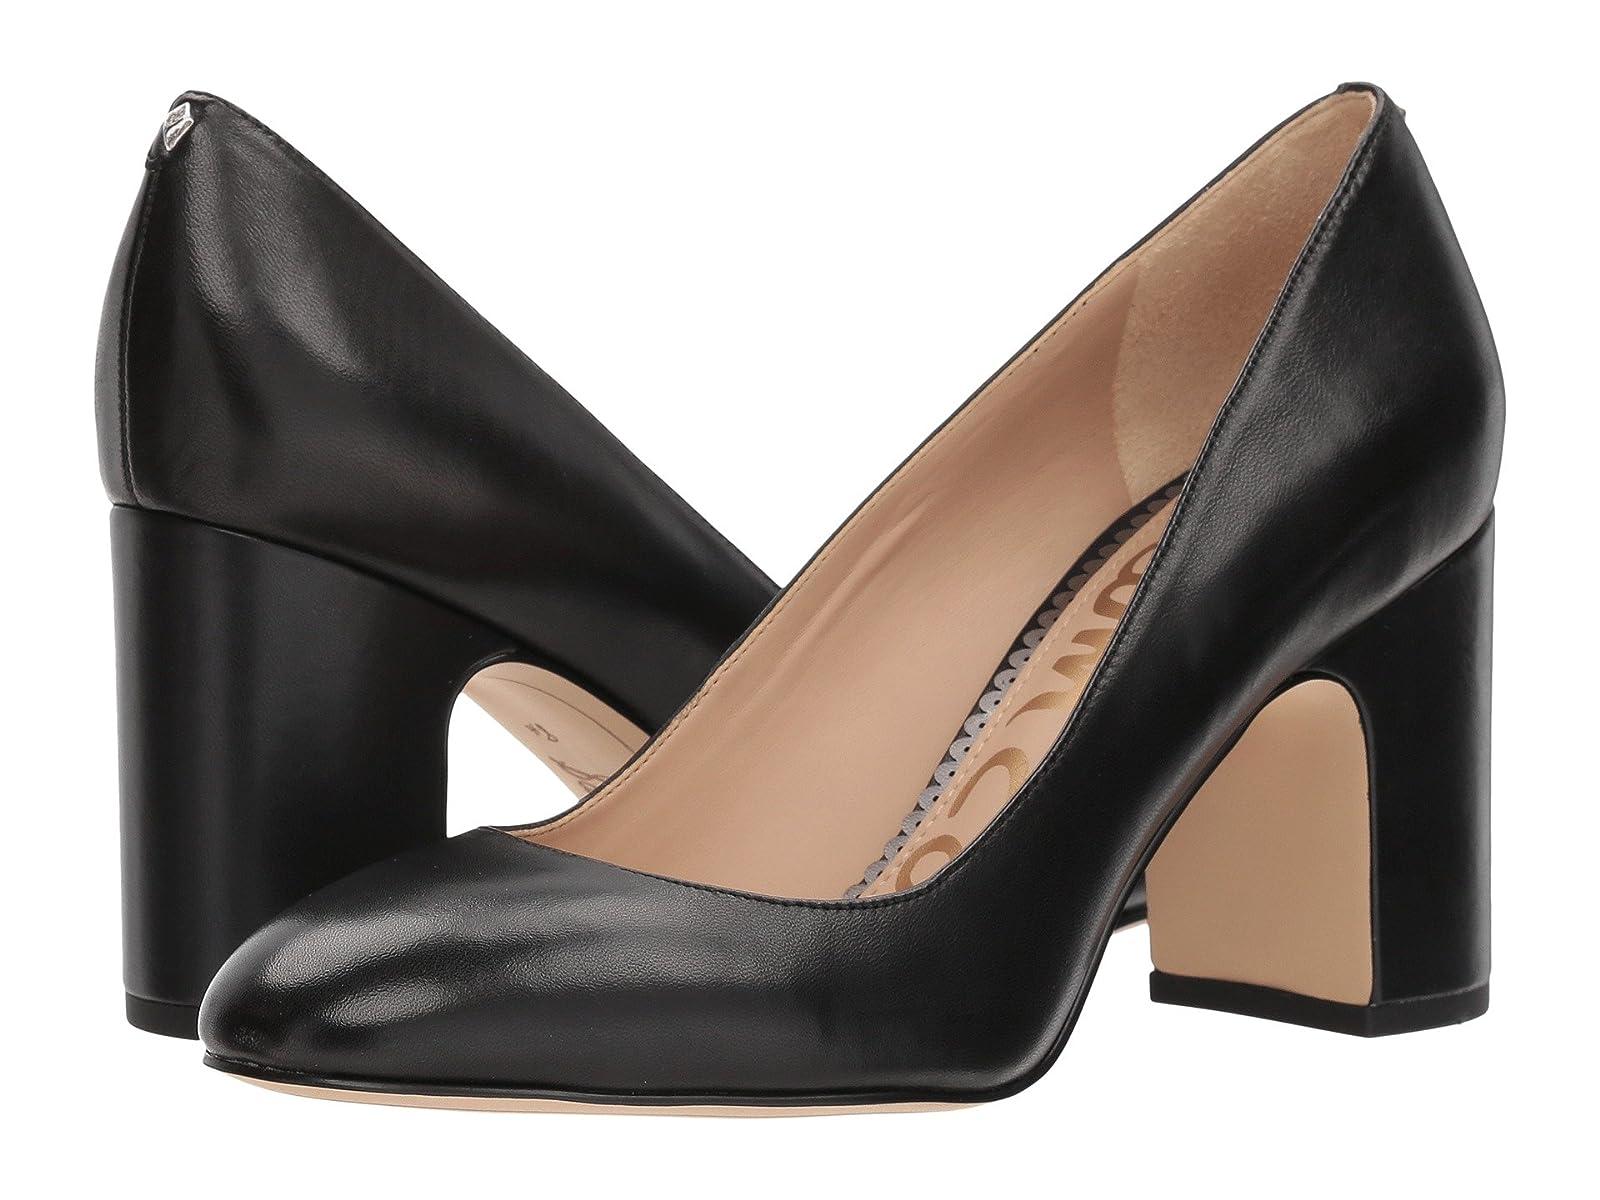 Sam Edelman JunieAtmospheric grades have affordable shoes